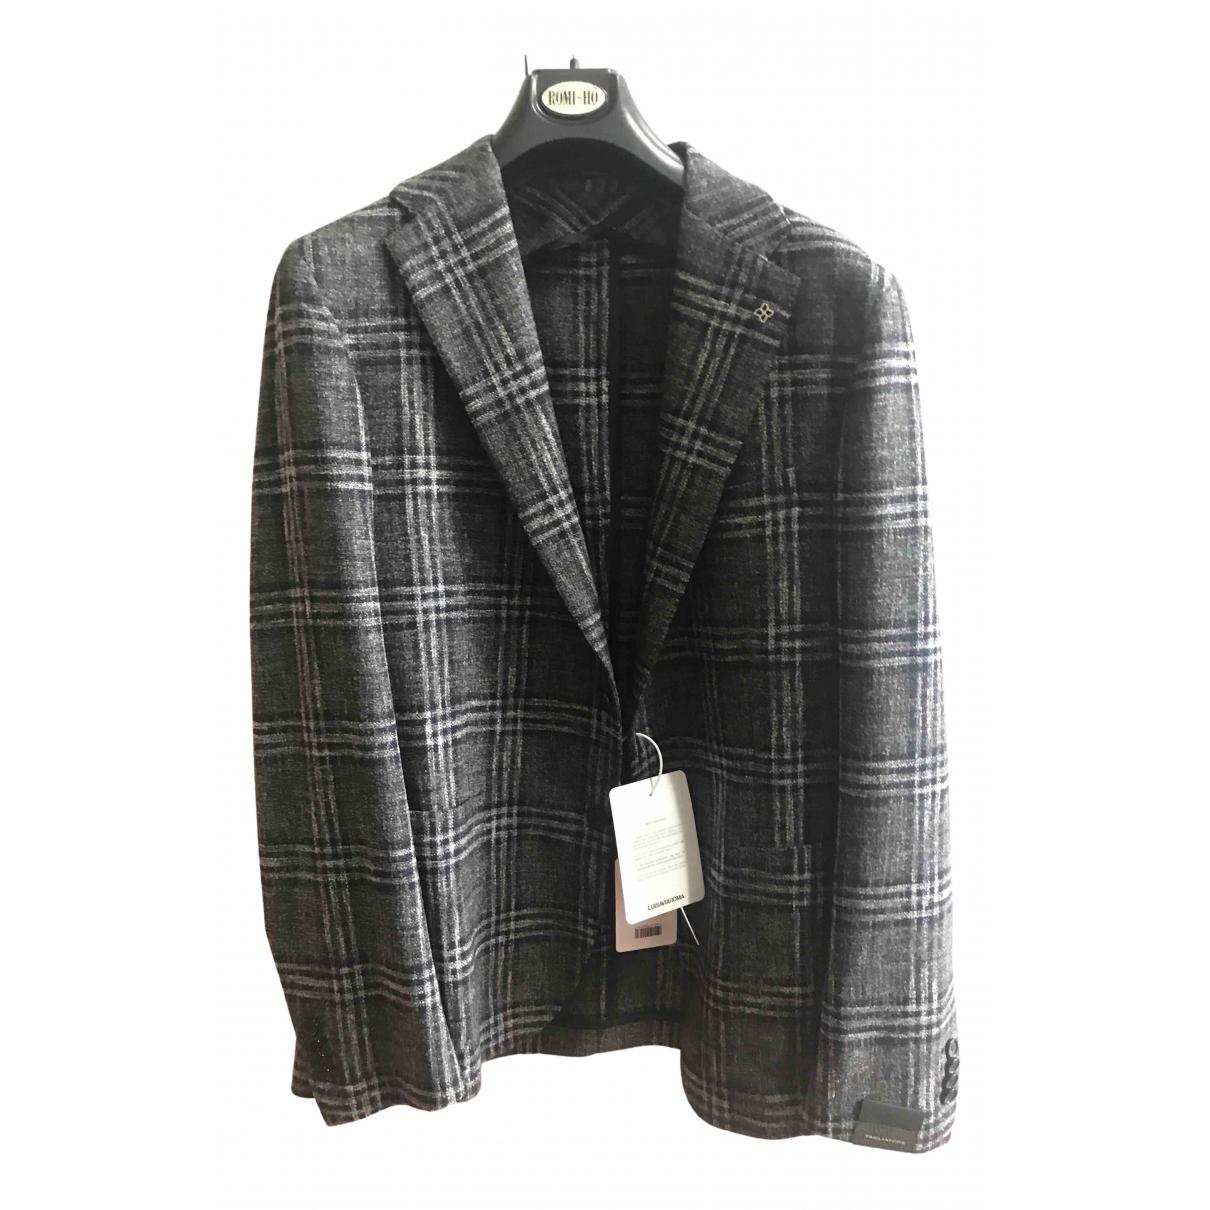 Tagliatore \N Jacke in  Grau Wolle